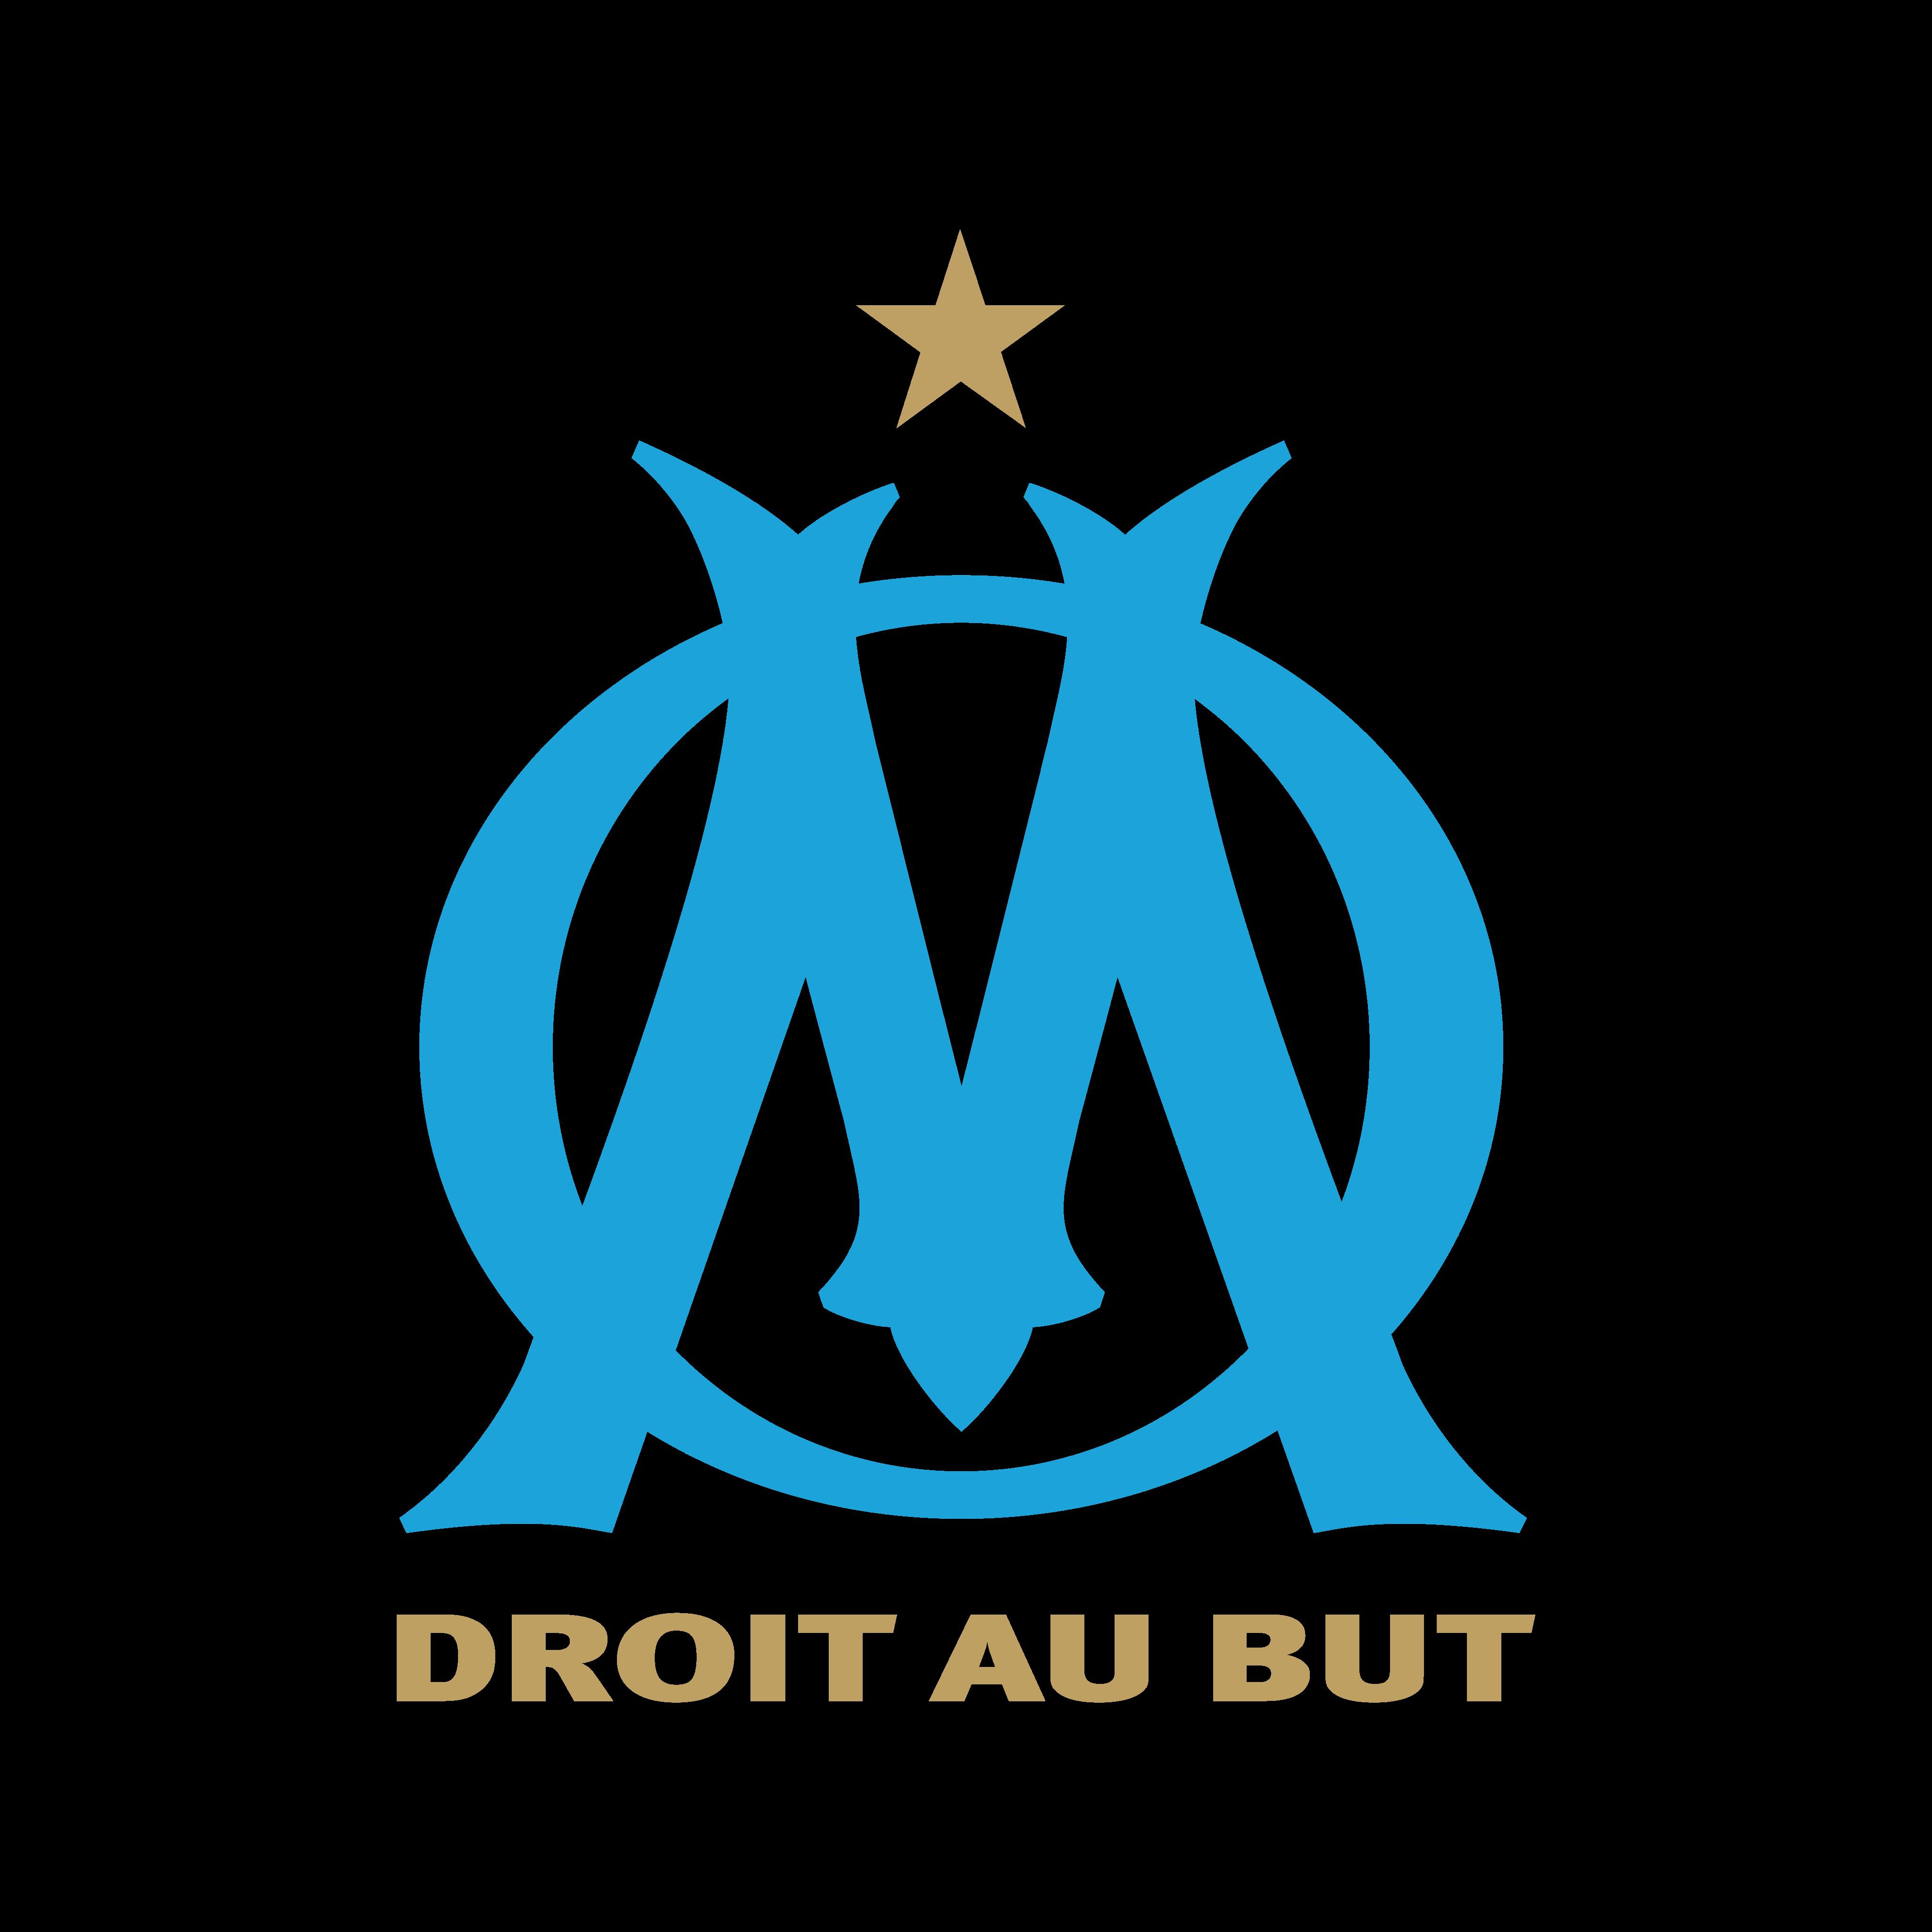 olympique de marseille 0 - Olympique de Marseille Logo